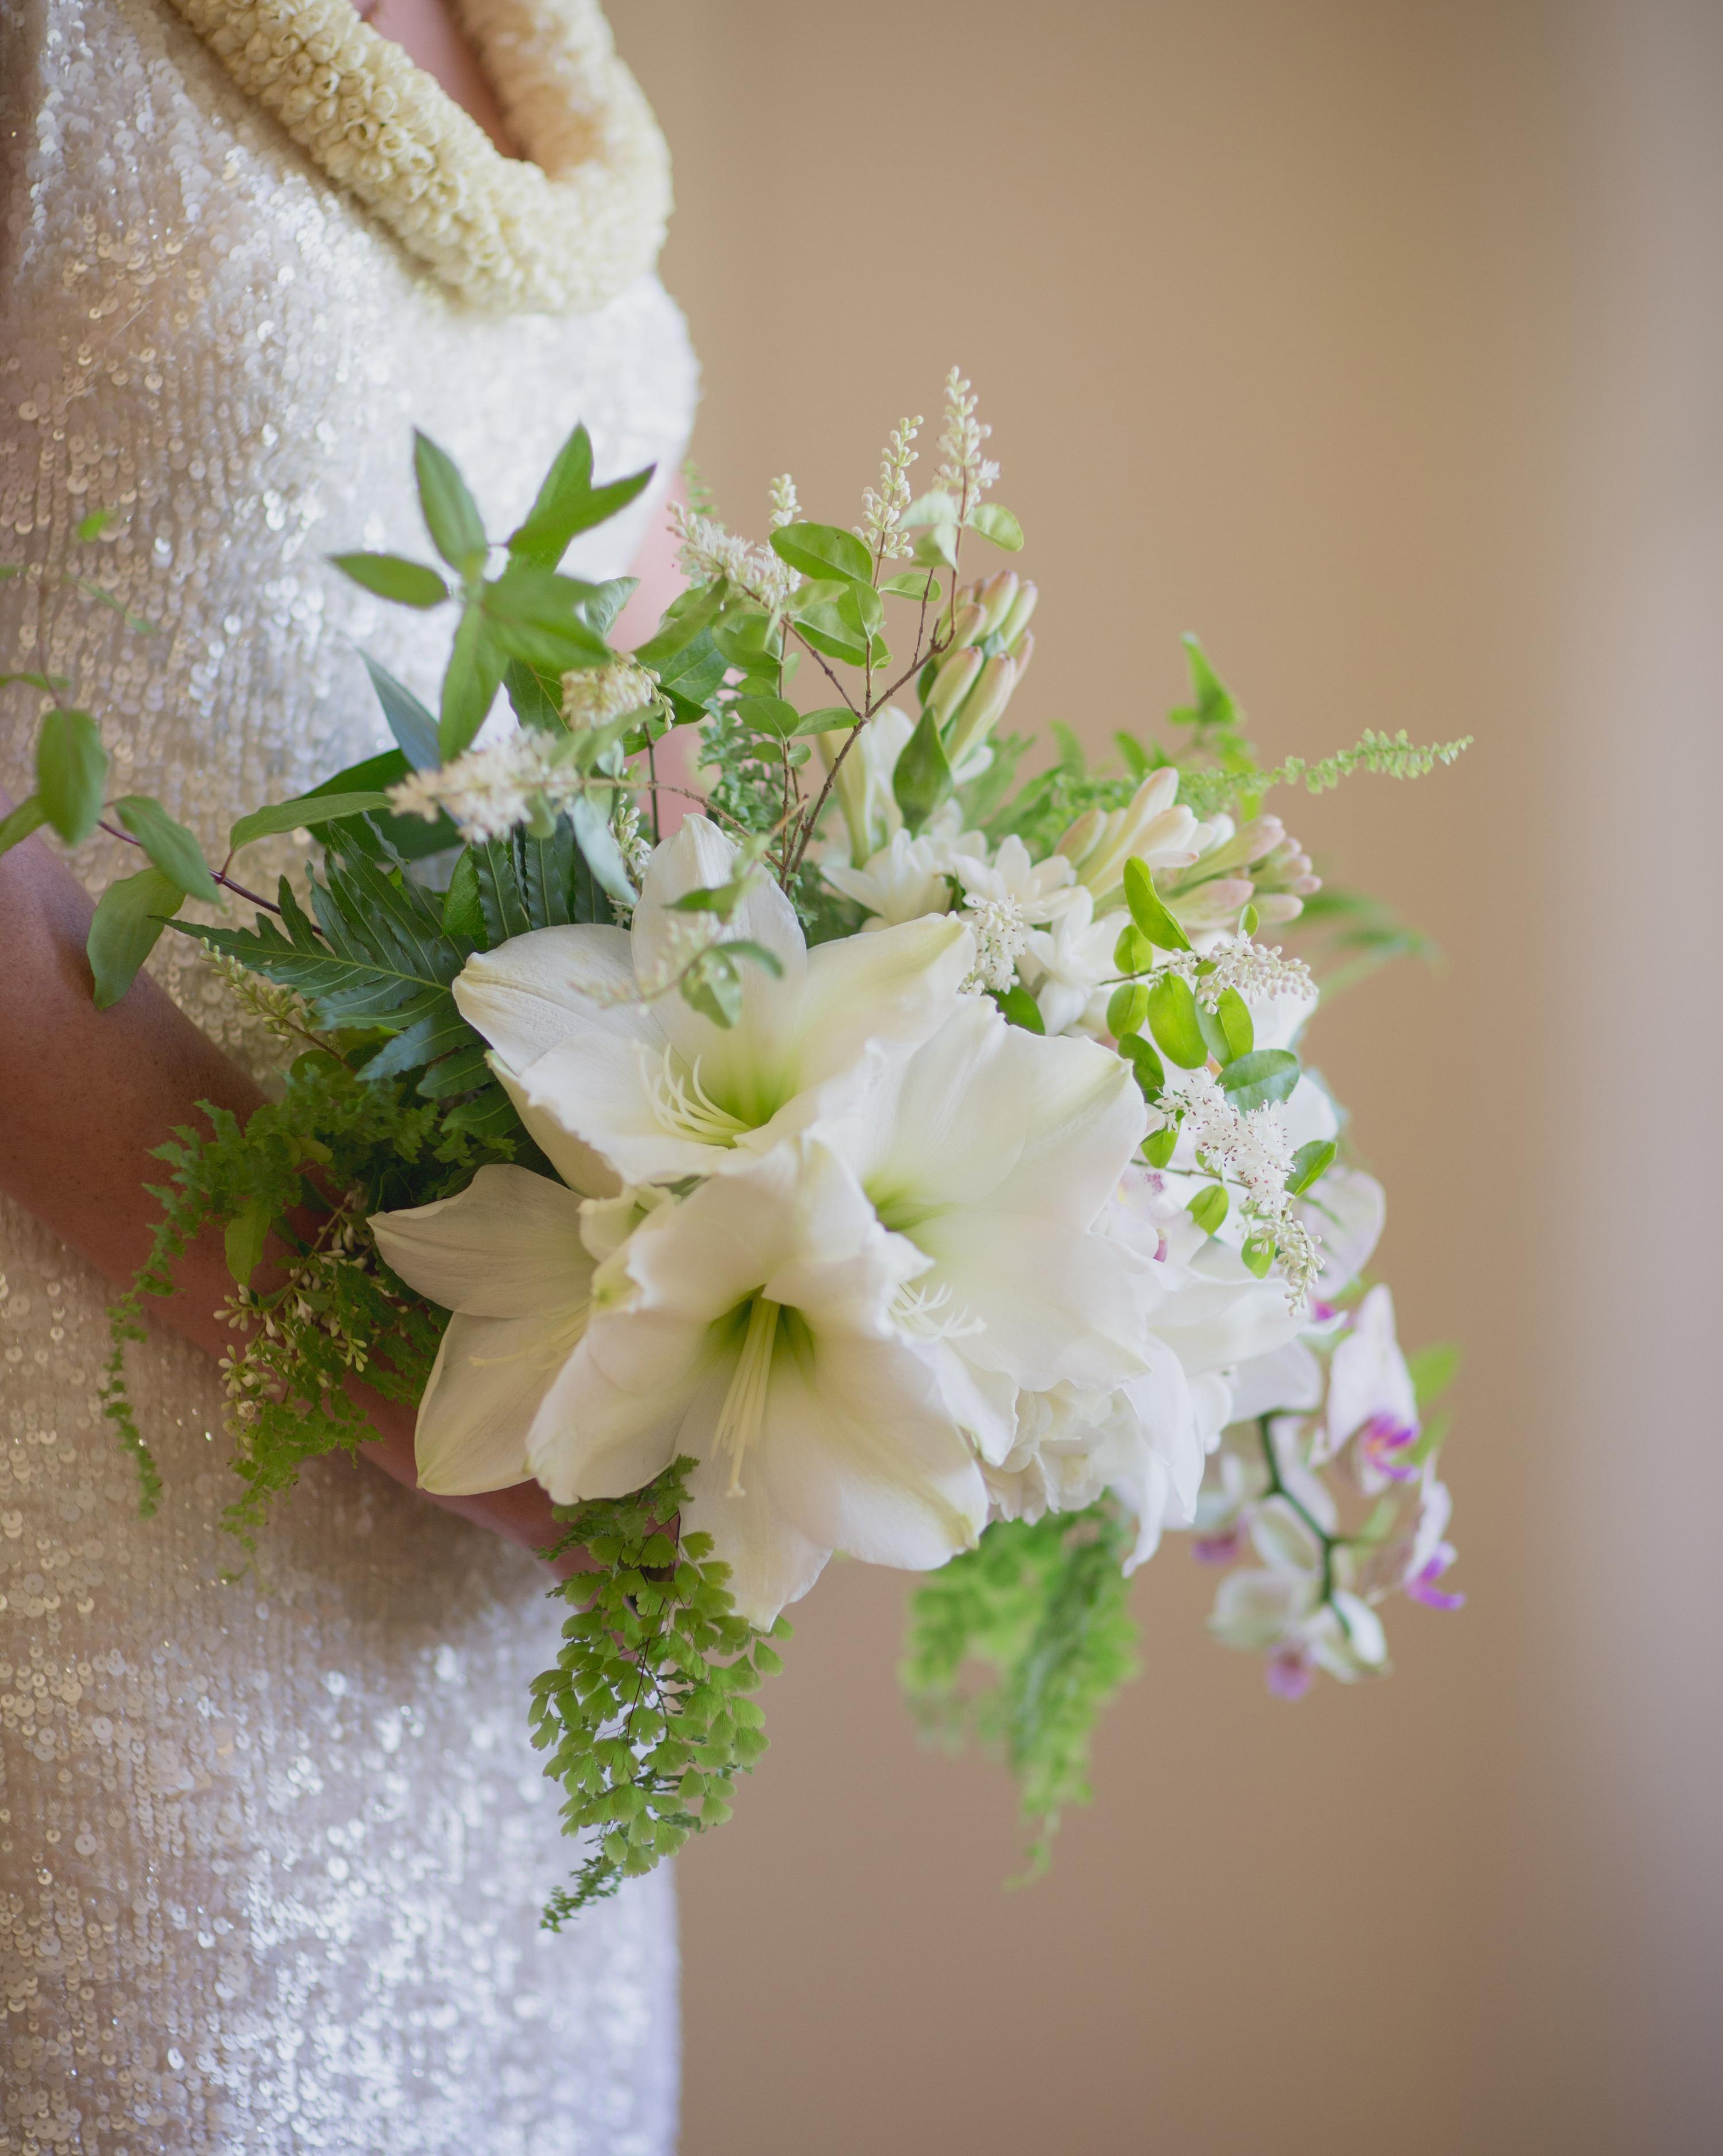 maddie-tony-wedding-bouquet-7061-s112424-1015.jpg